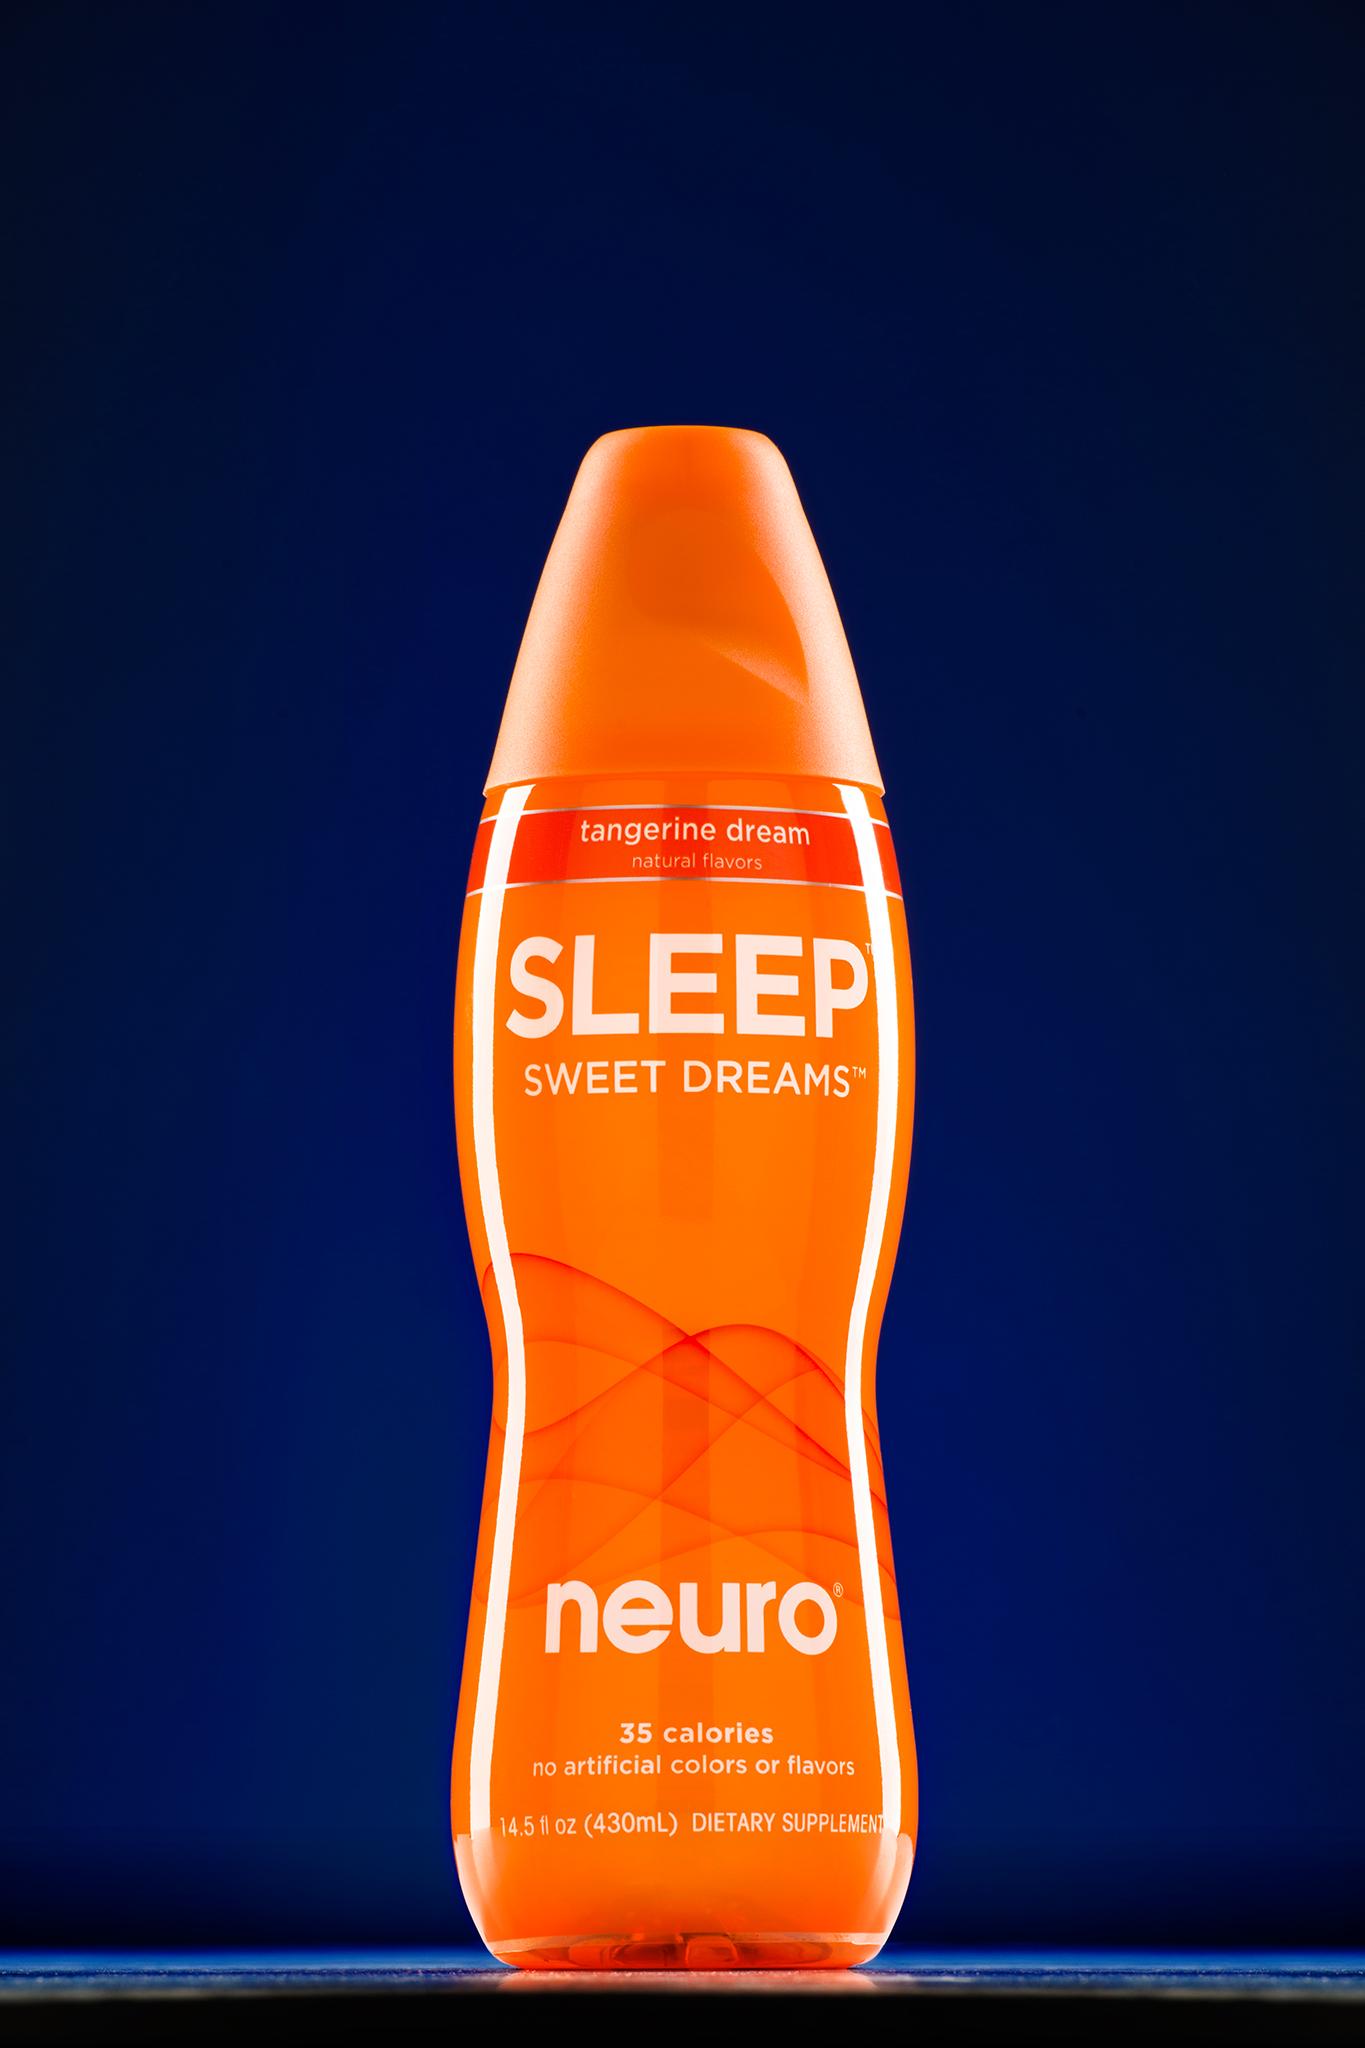 neuro-sleep.jpg